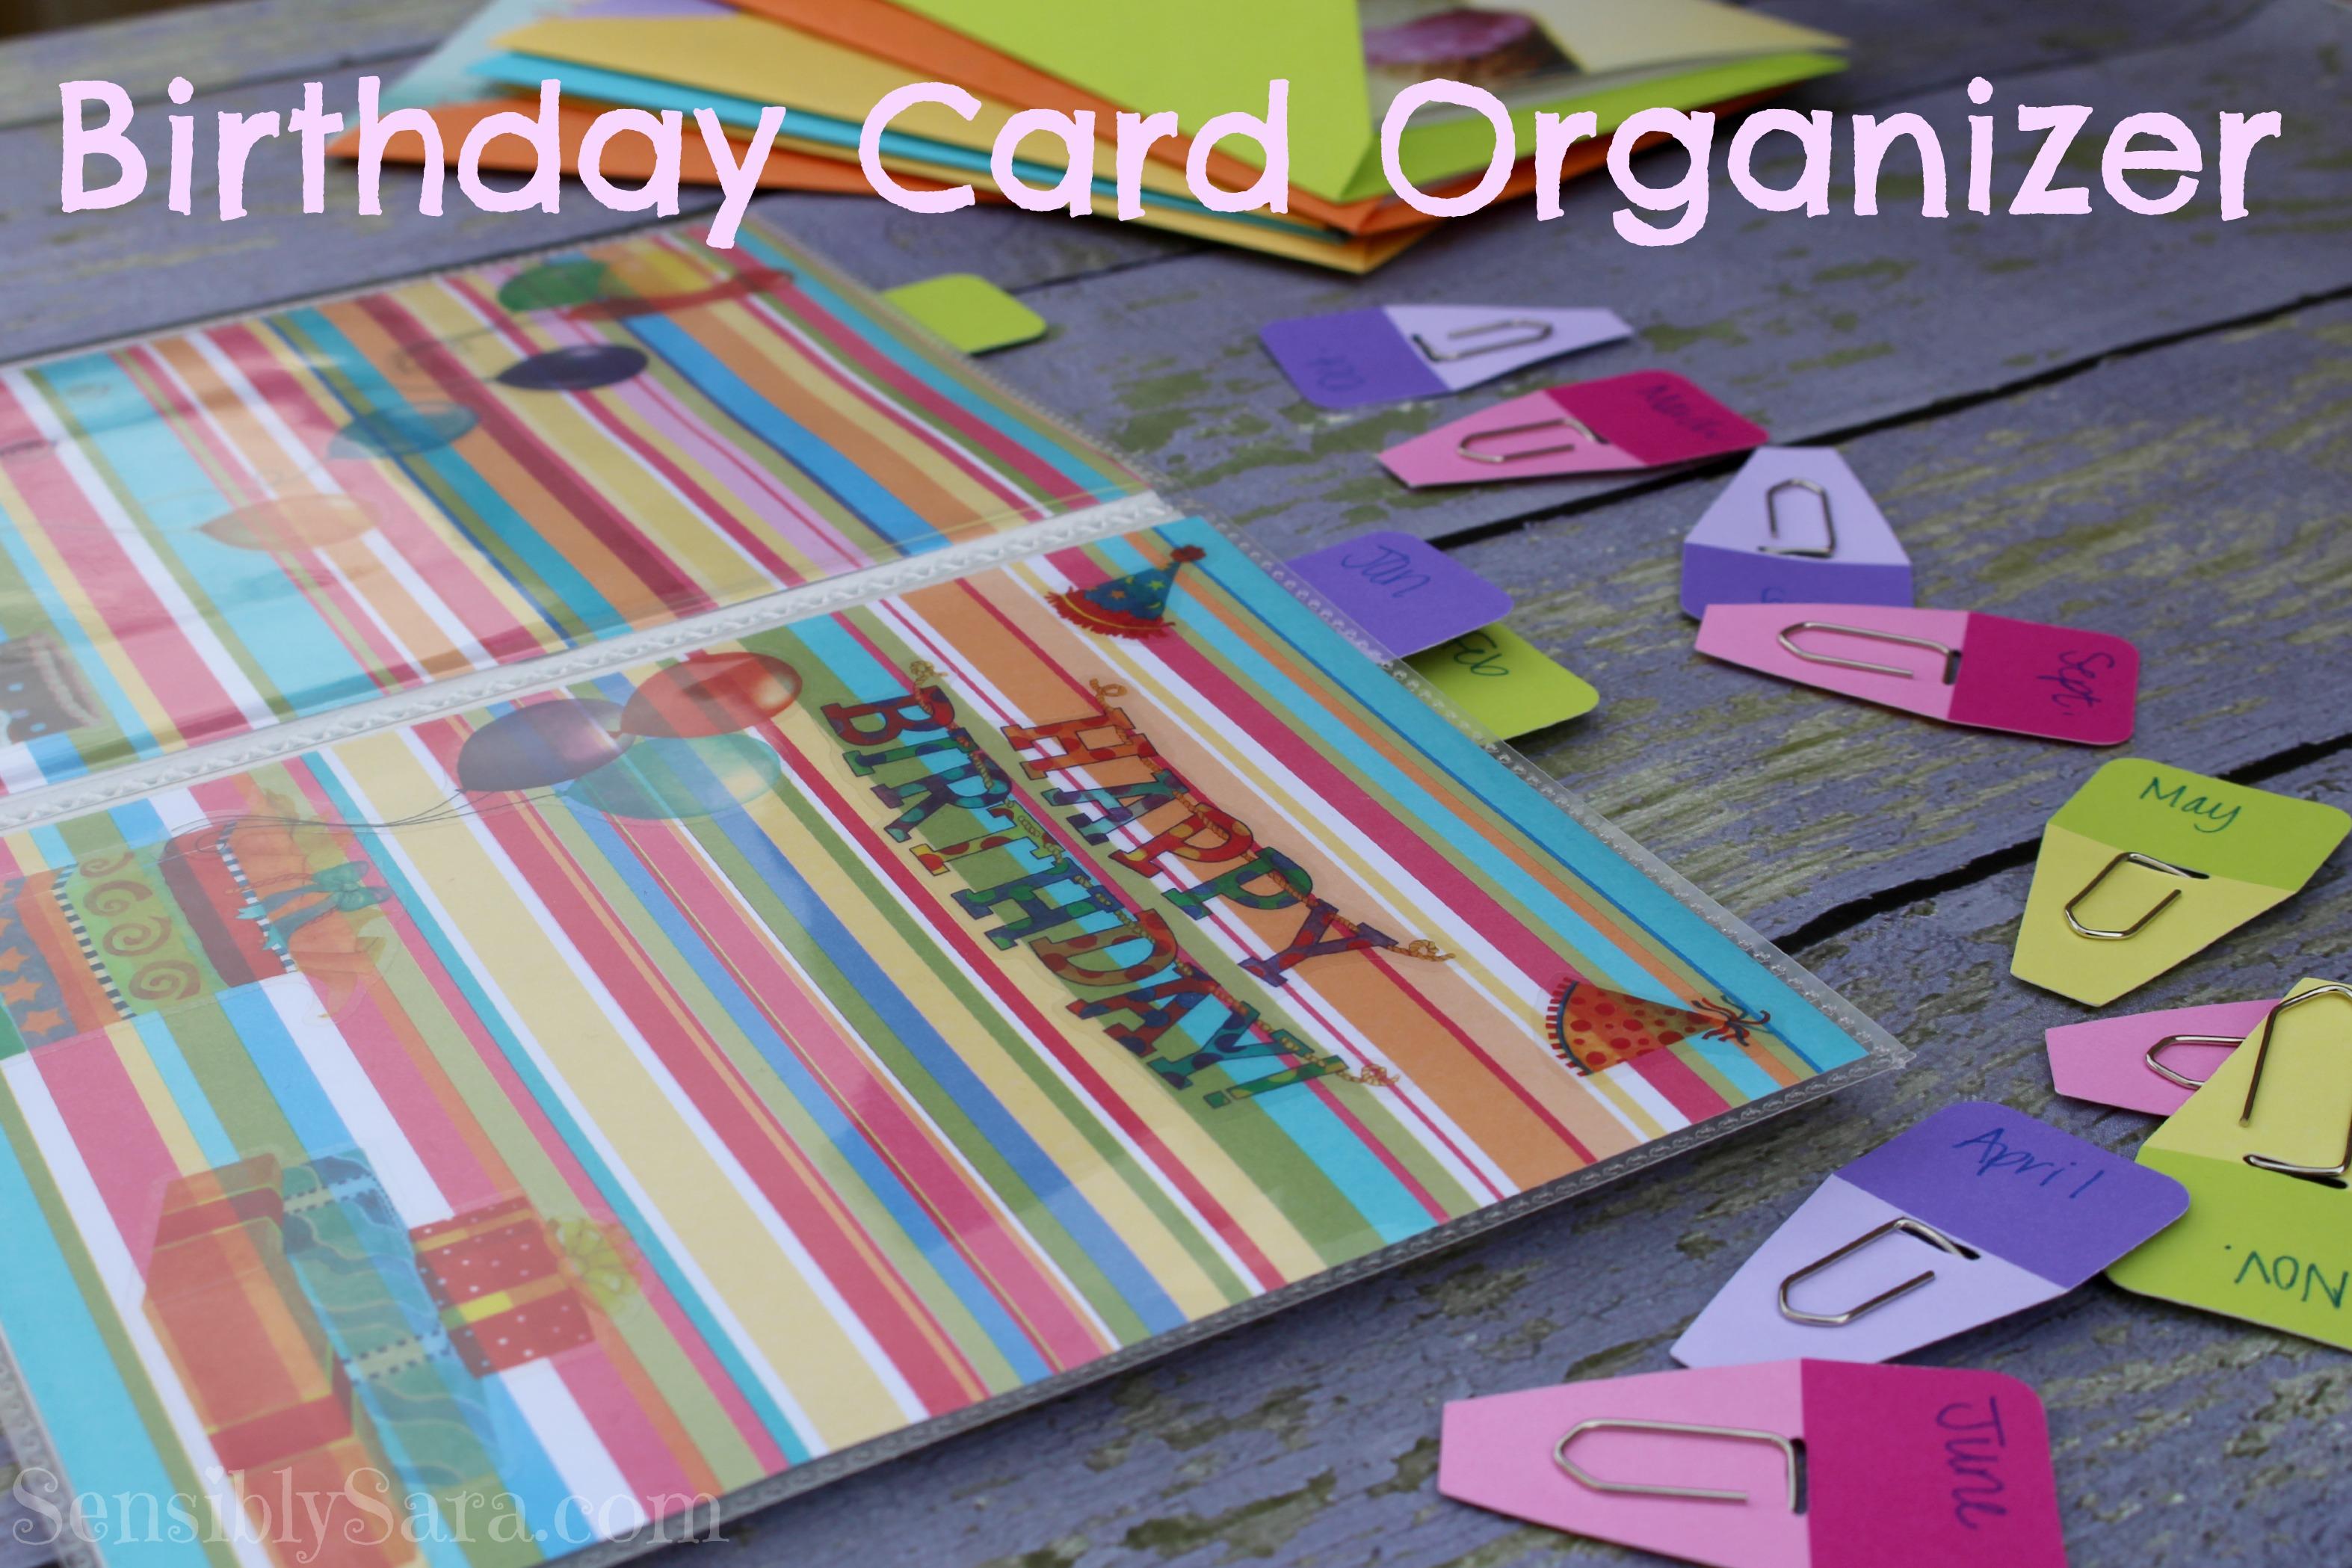 diy birthday card organizer valuecards shop cbias, Birthday card